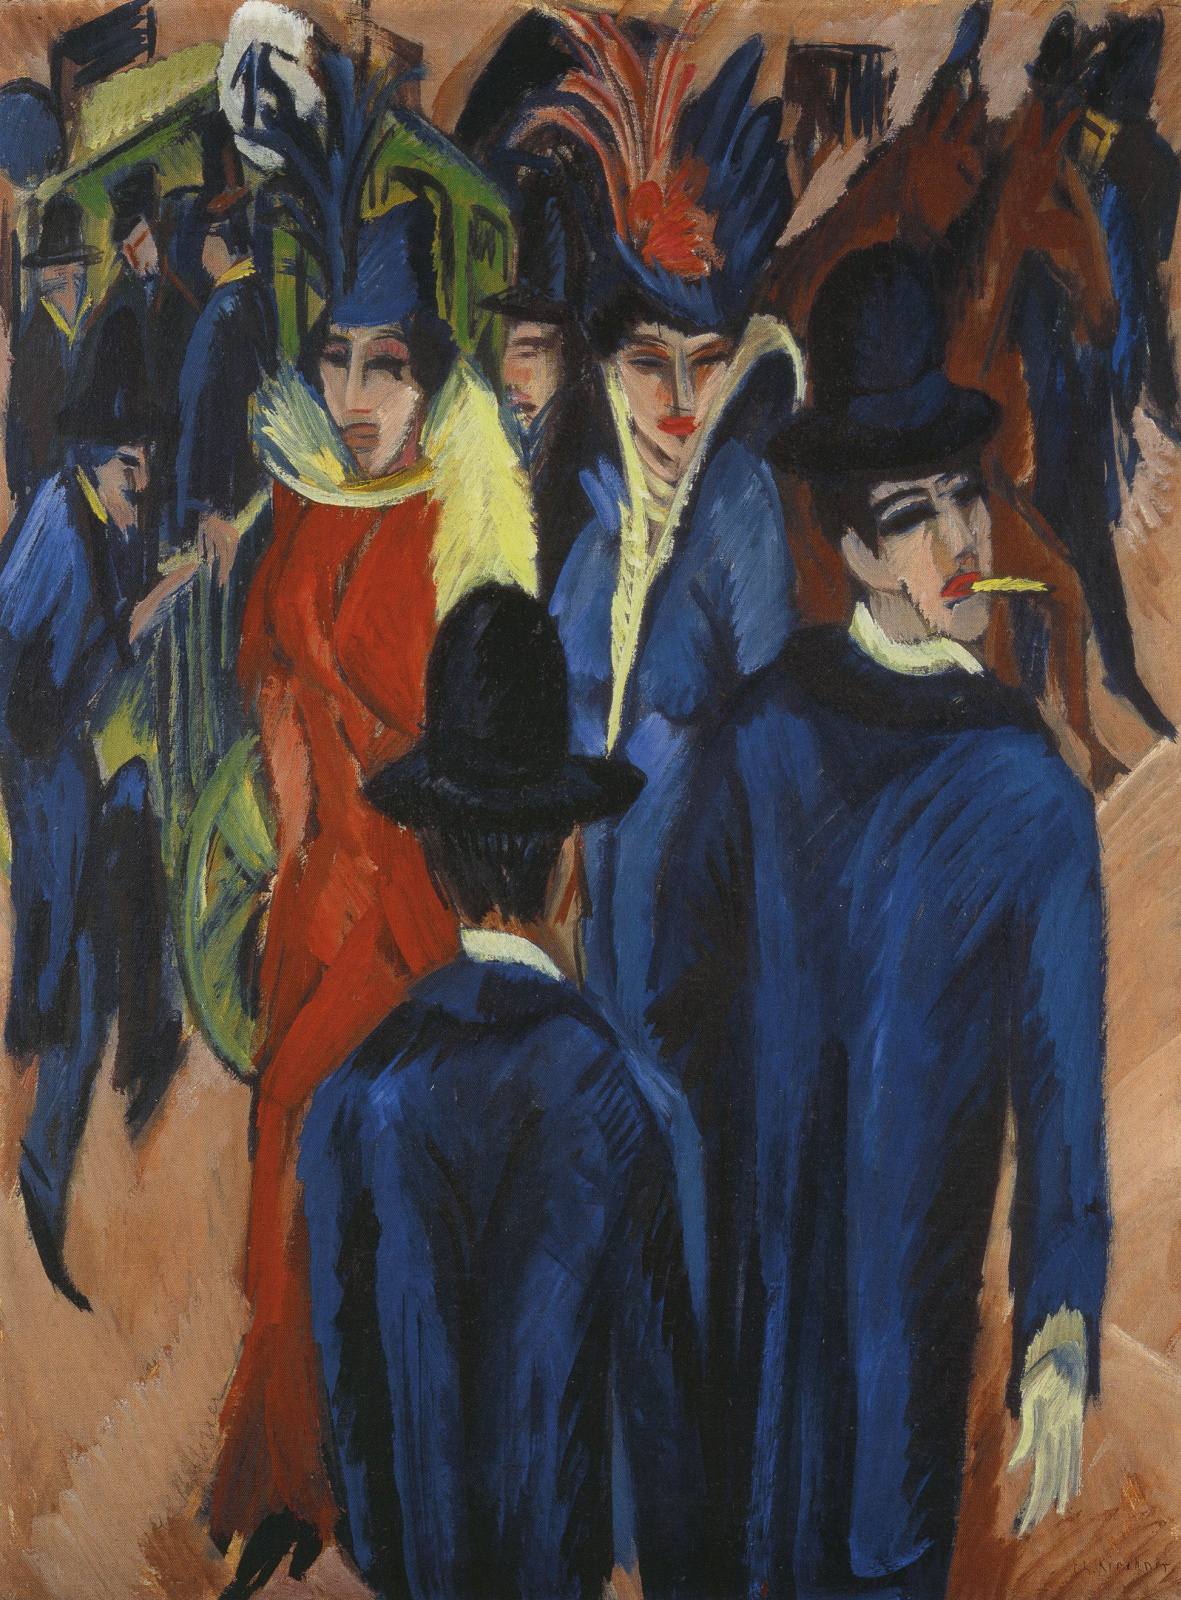 Ernst Ludwig Kirchner. Street scene in Berlin